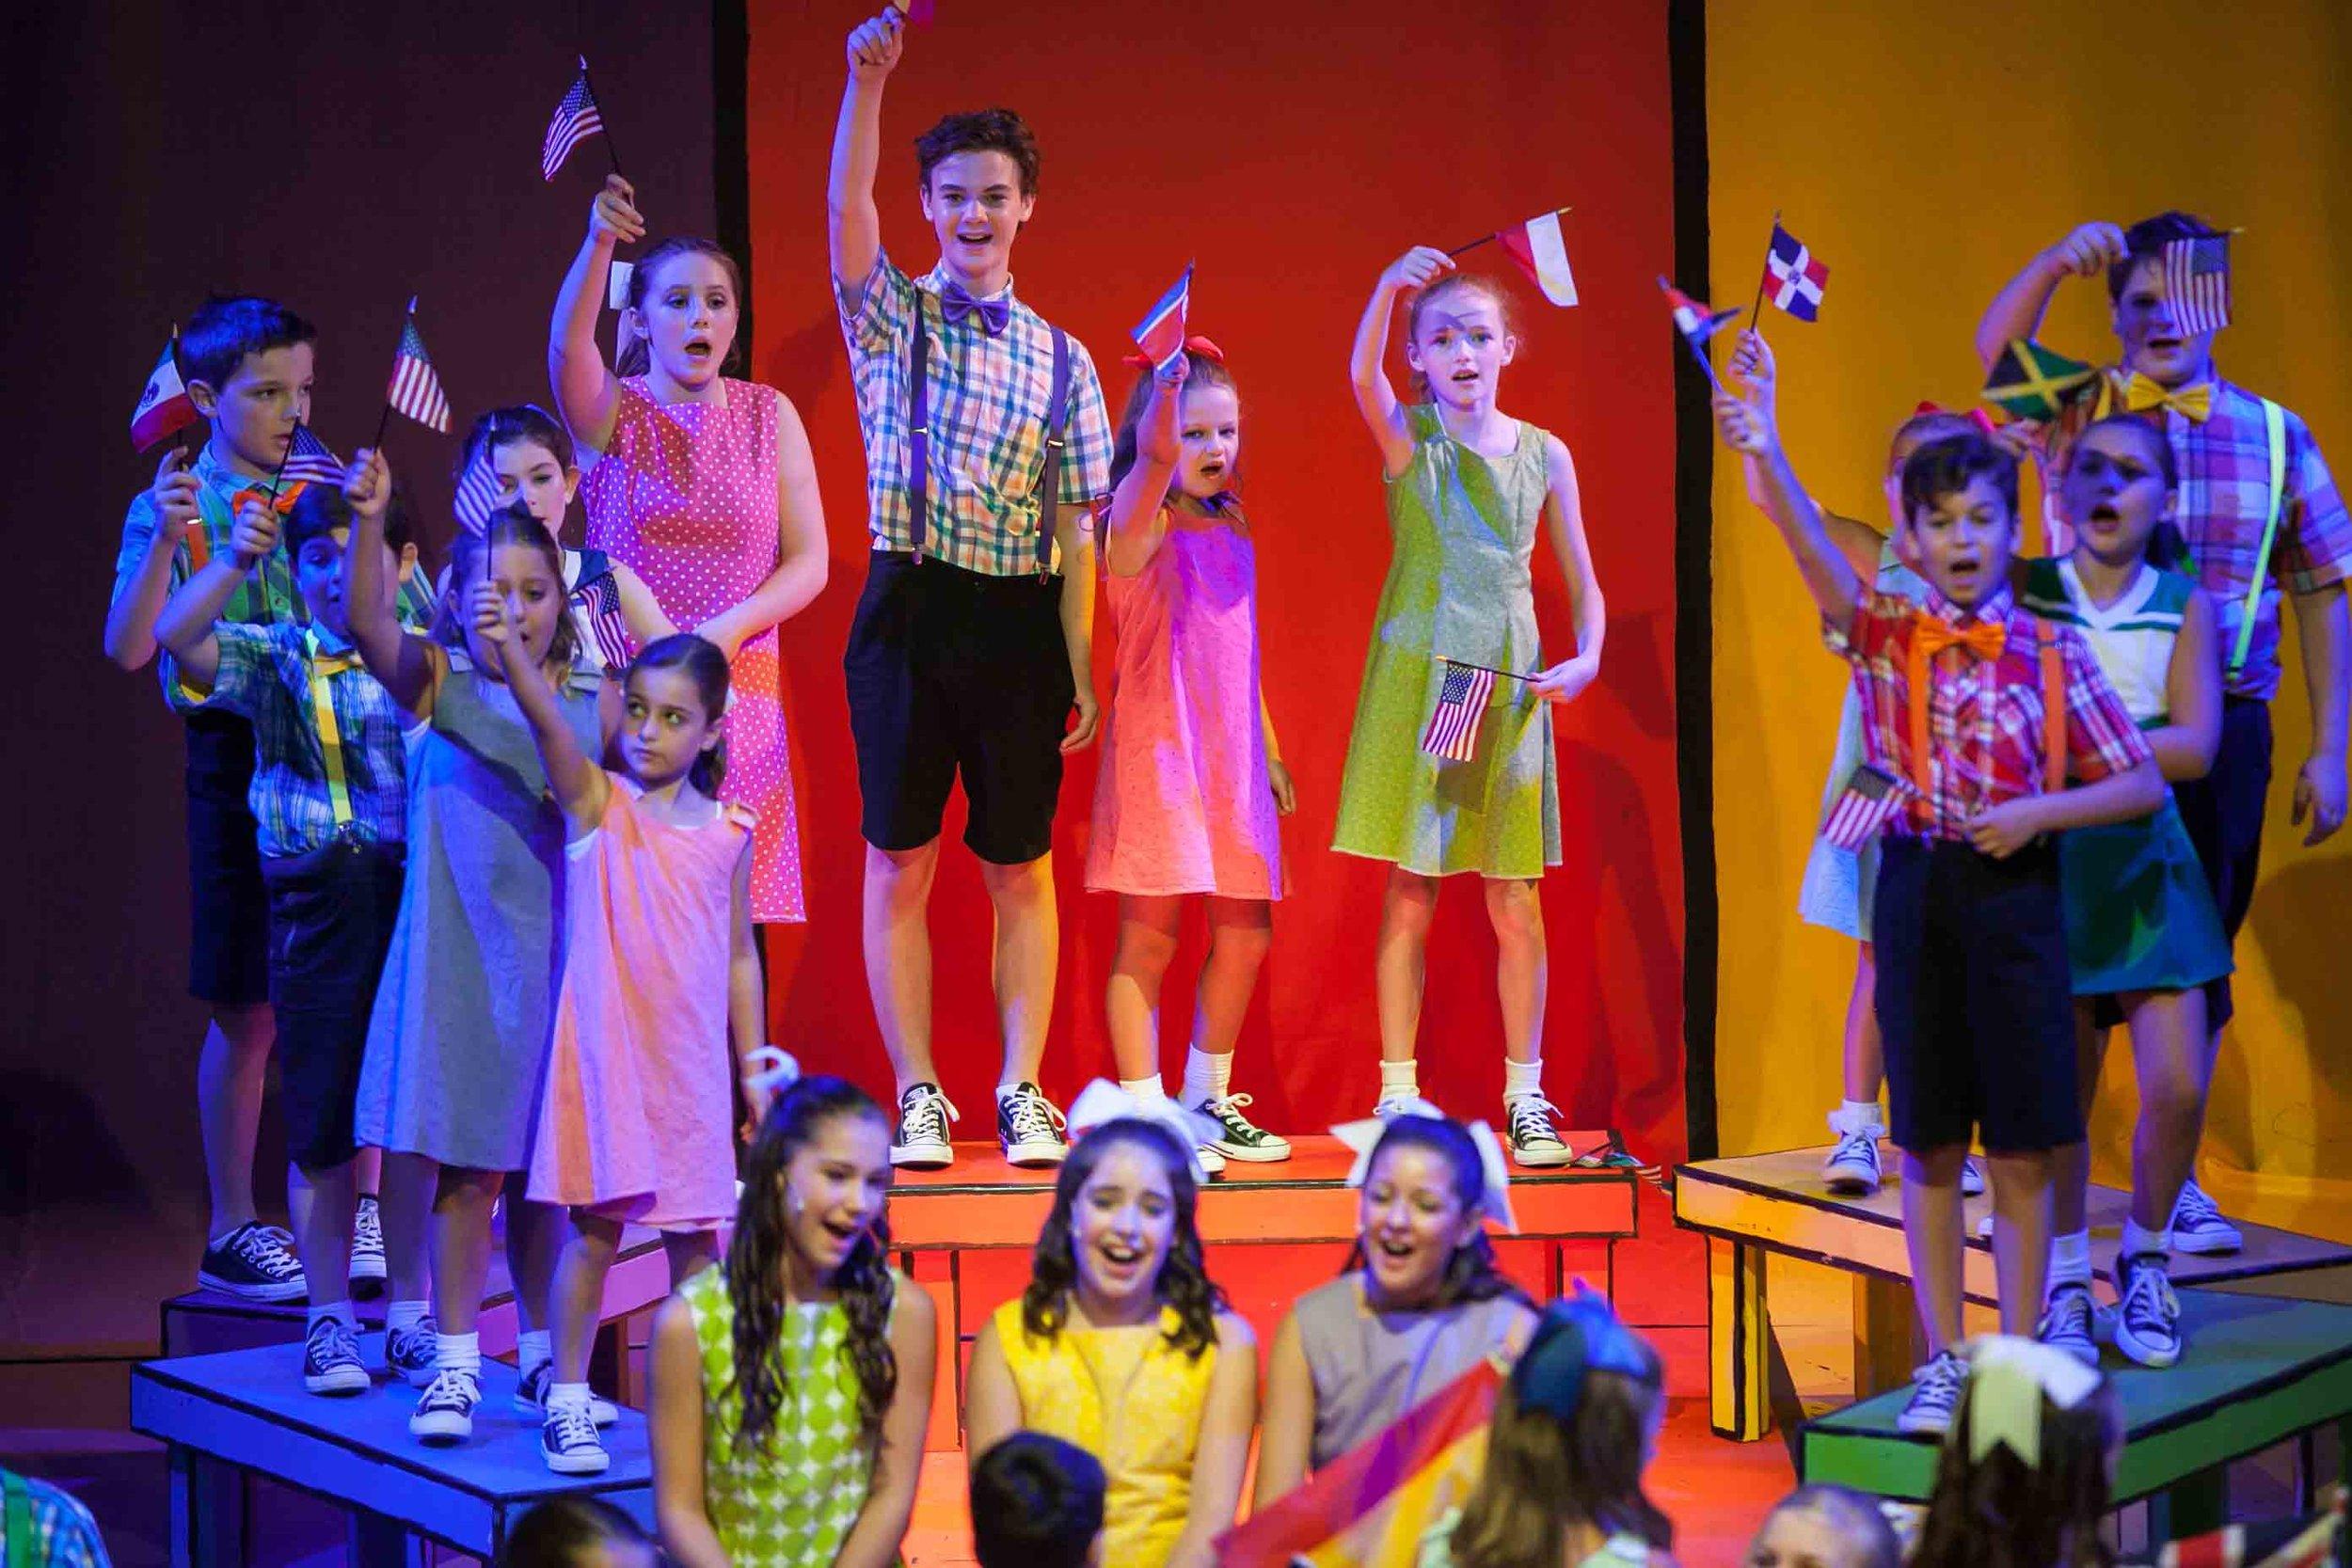 7-24-16 Whiz Kids Cast 0185.jpg